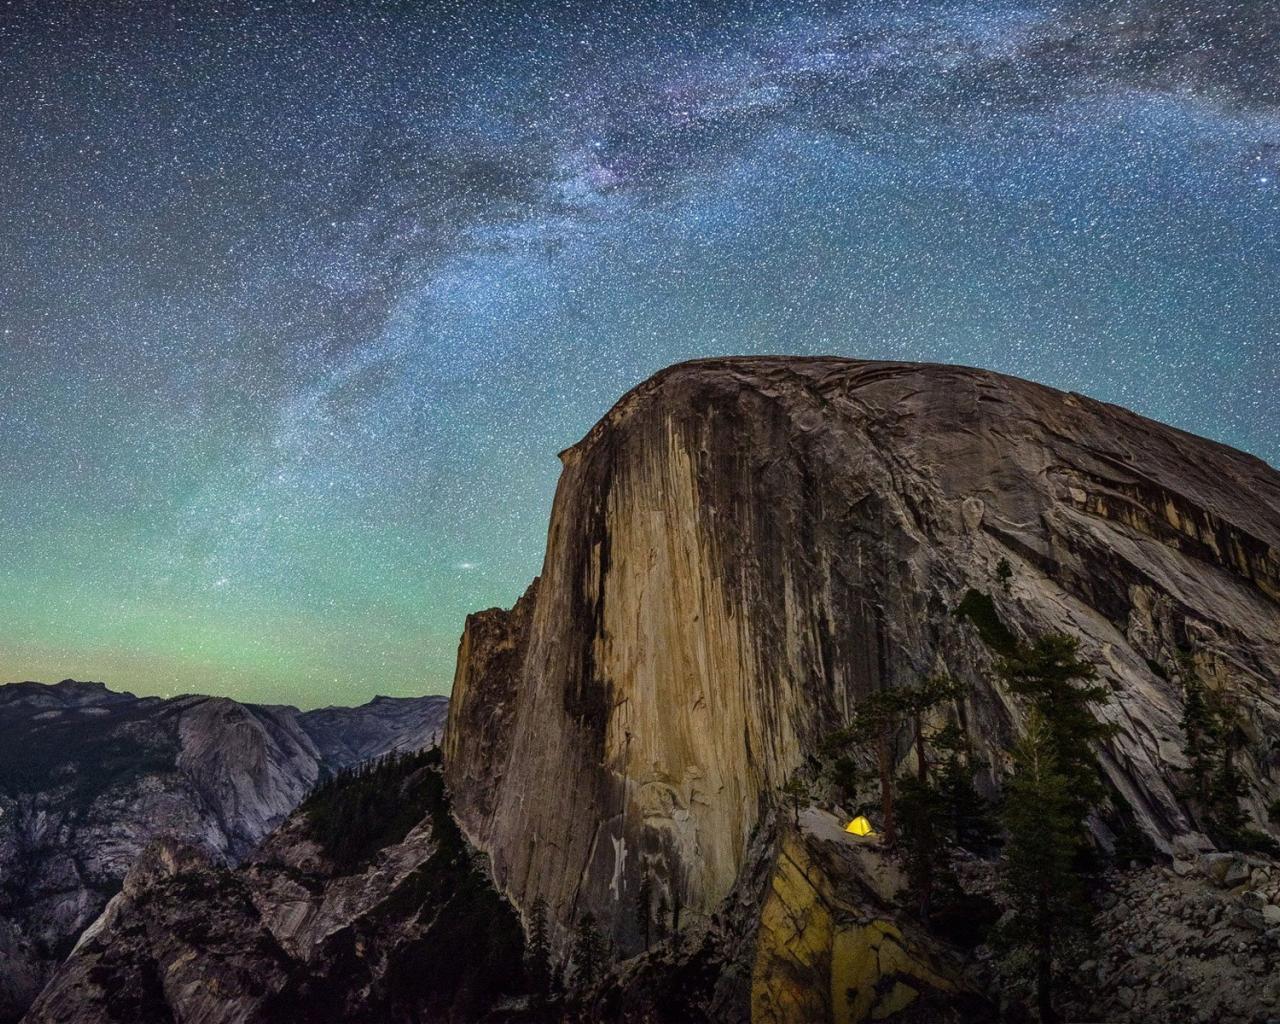 download Yosemite Camp 1080p Wallpaper New HD Wallpapers 1280x1024